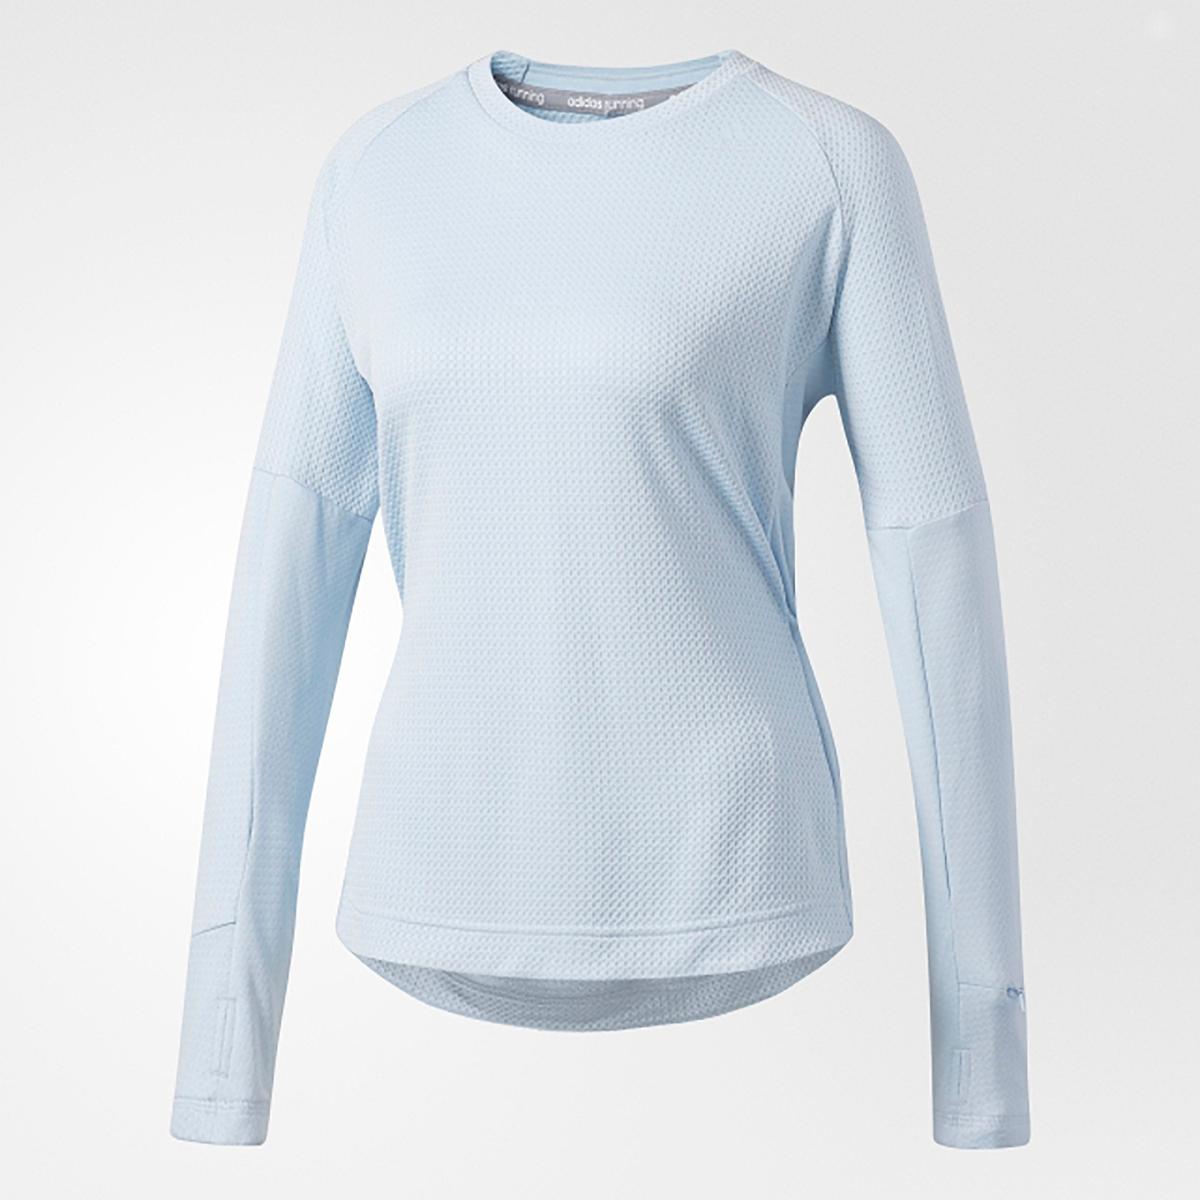 Camiseta lisa con cuello redondo, manga larga